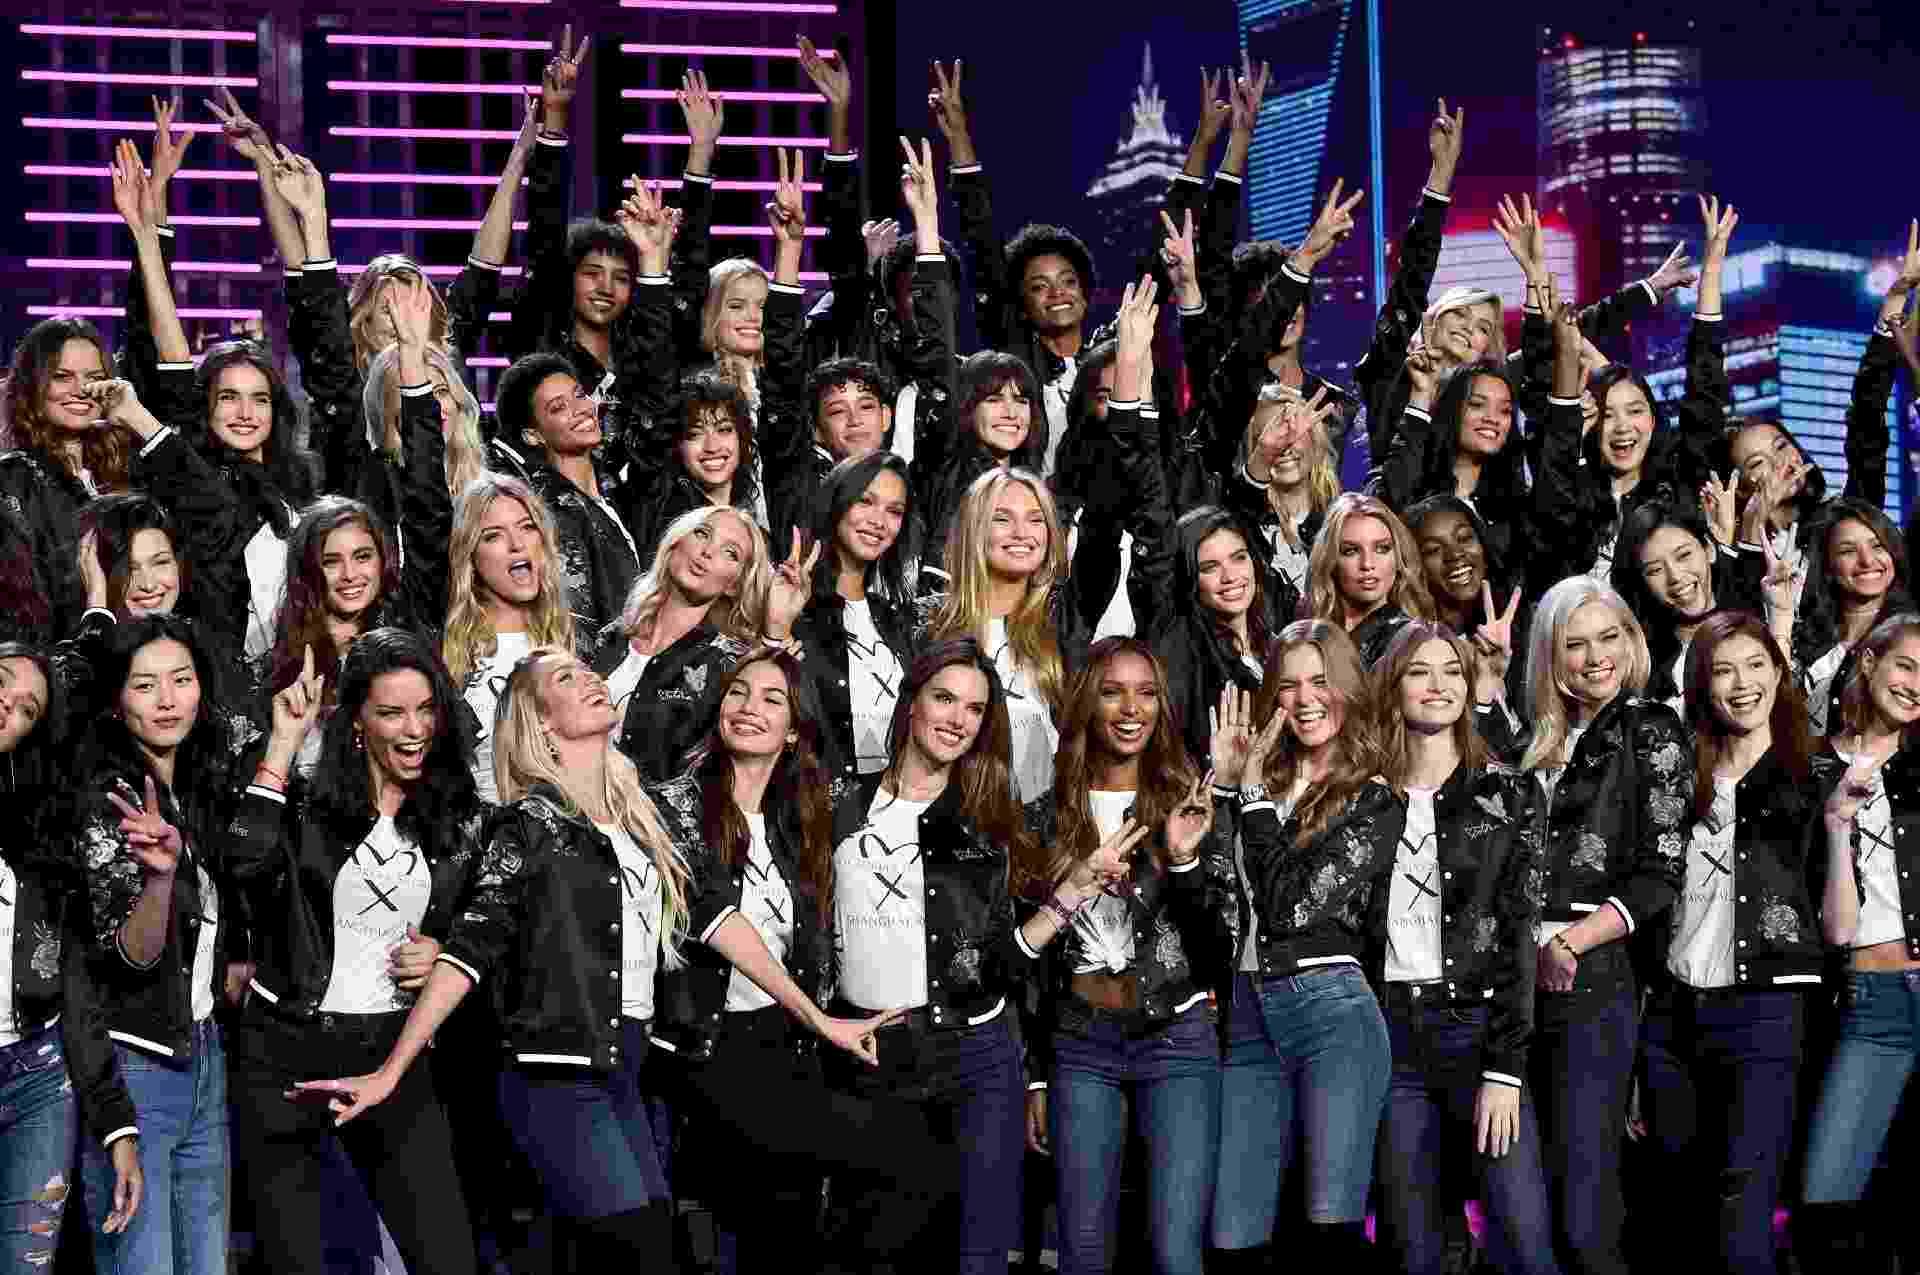 Victoria's Secrets Fashion Show - Getty Images